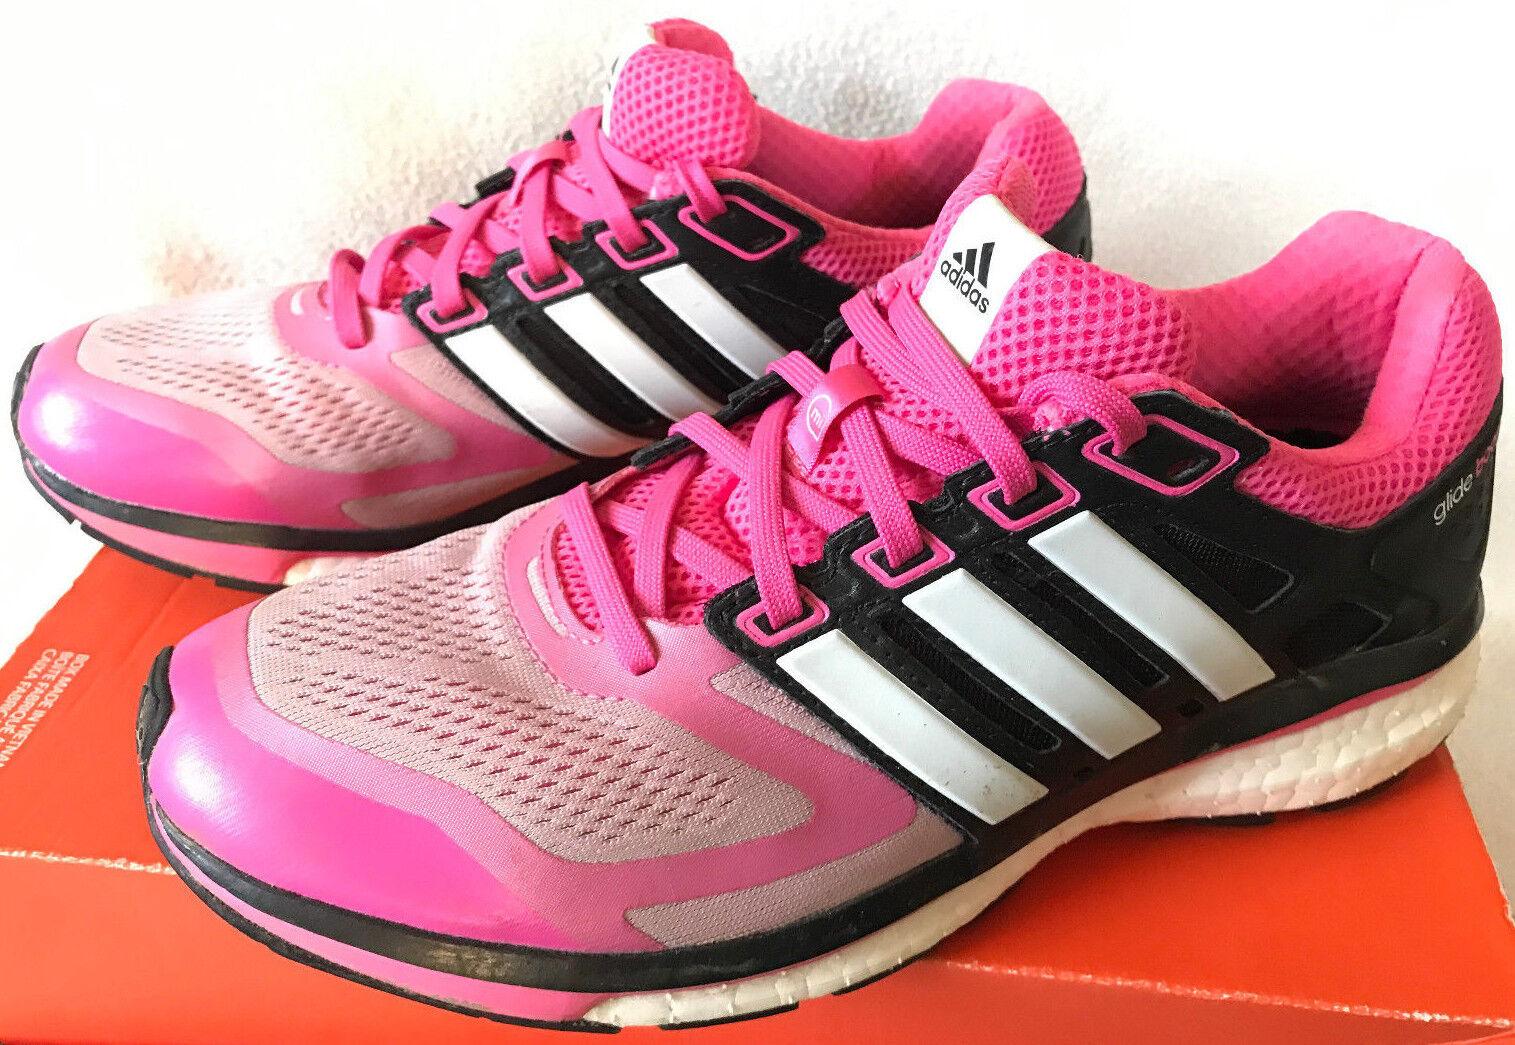 Adidas Supernova Glide 6 6 6 W Pink M17427 Blk BCA Marathon Running shoes Women's 9 03e295